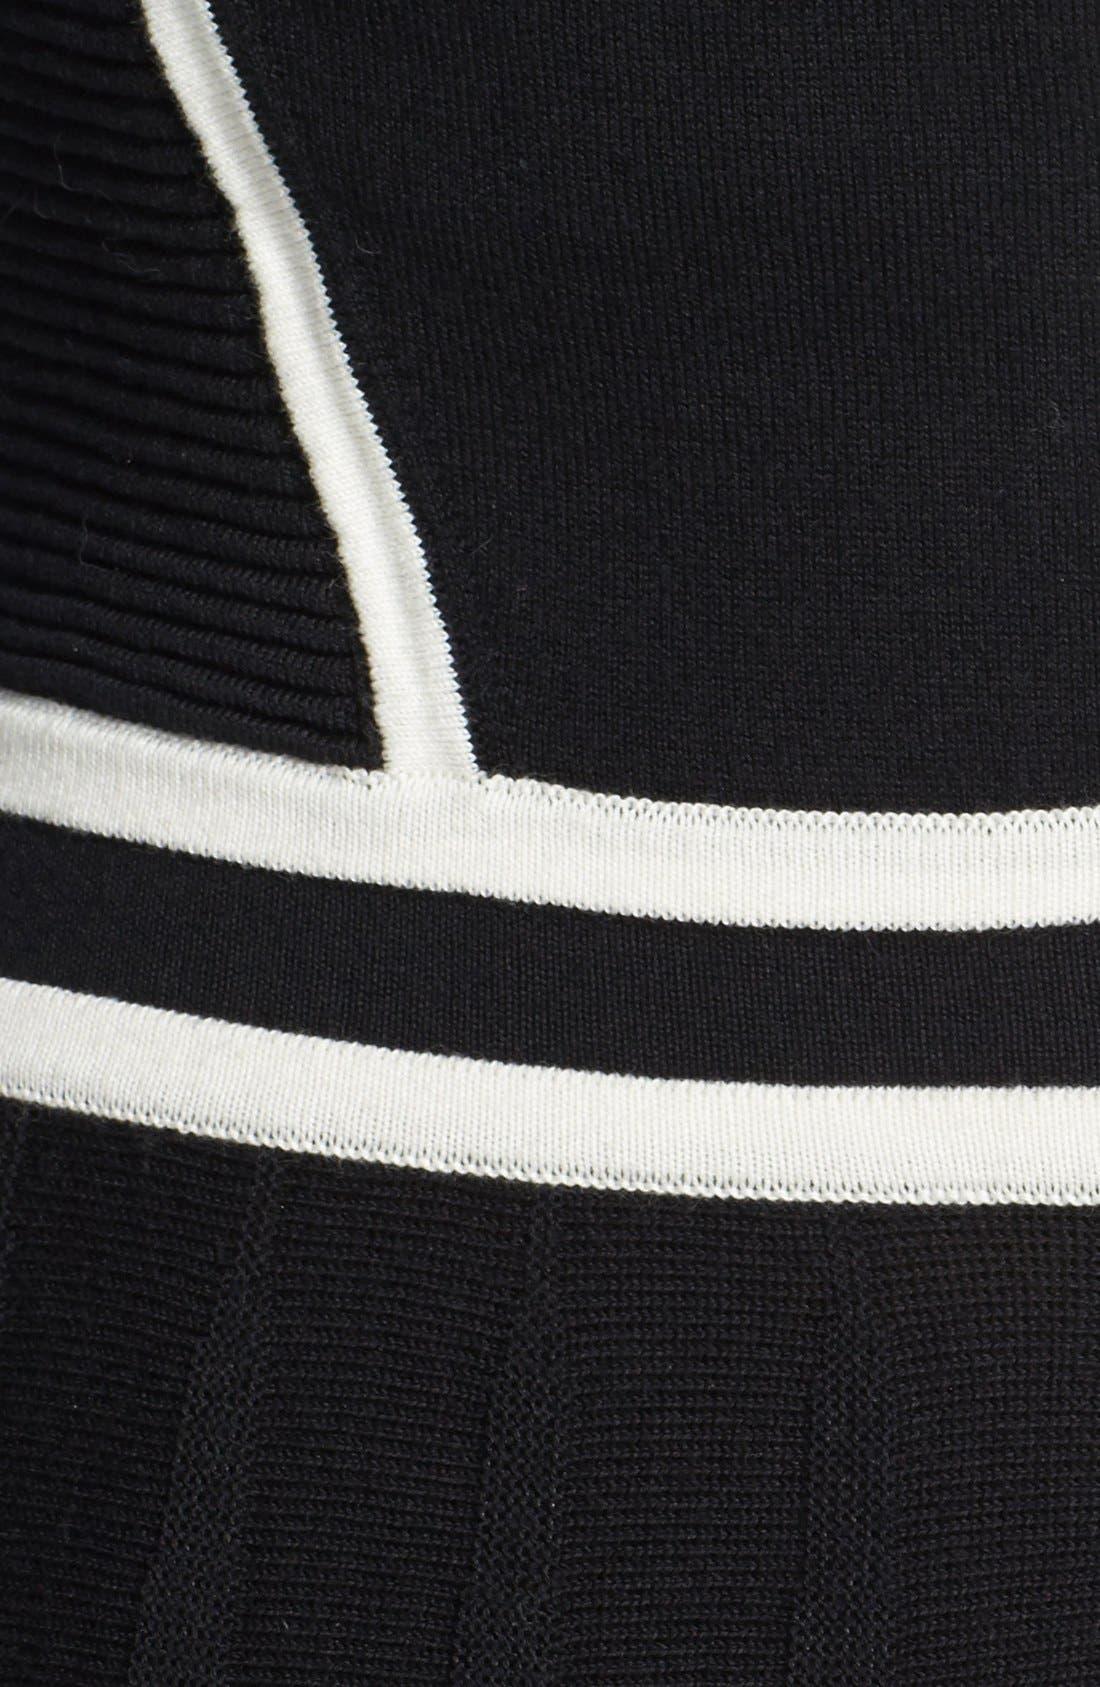 Alternate Image 3  - MARC BY MARC JACOBS 'Alexis' Cotton Blend Sweater Dress